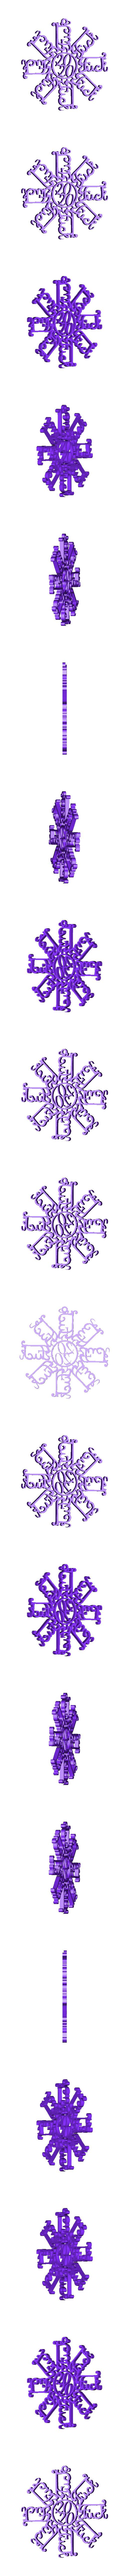 fuck 2020 star.stl Download STL file Fuck 2020 Christmas Ornament • 3D printable model, Simple_Designs